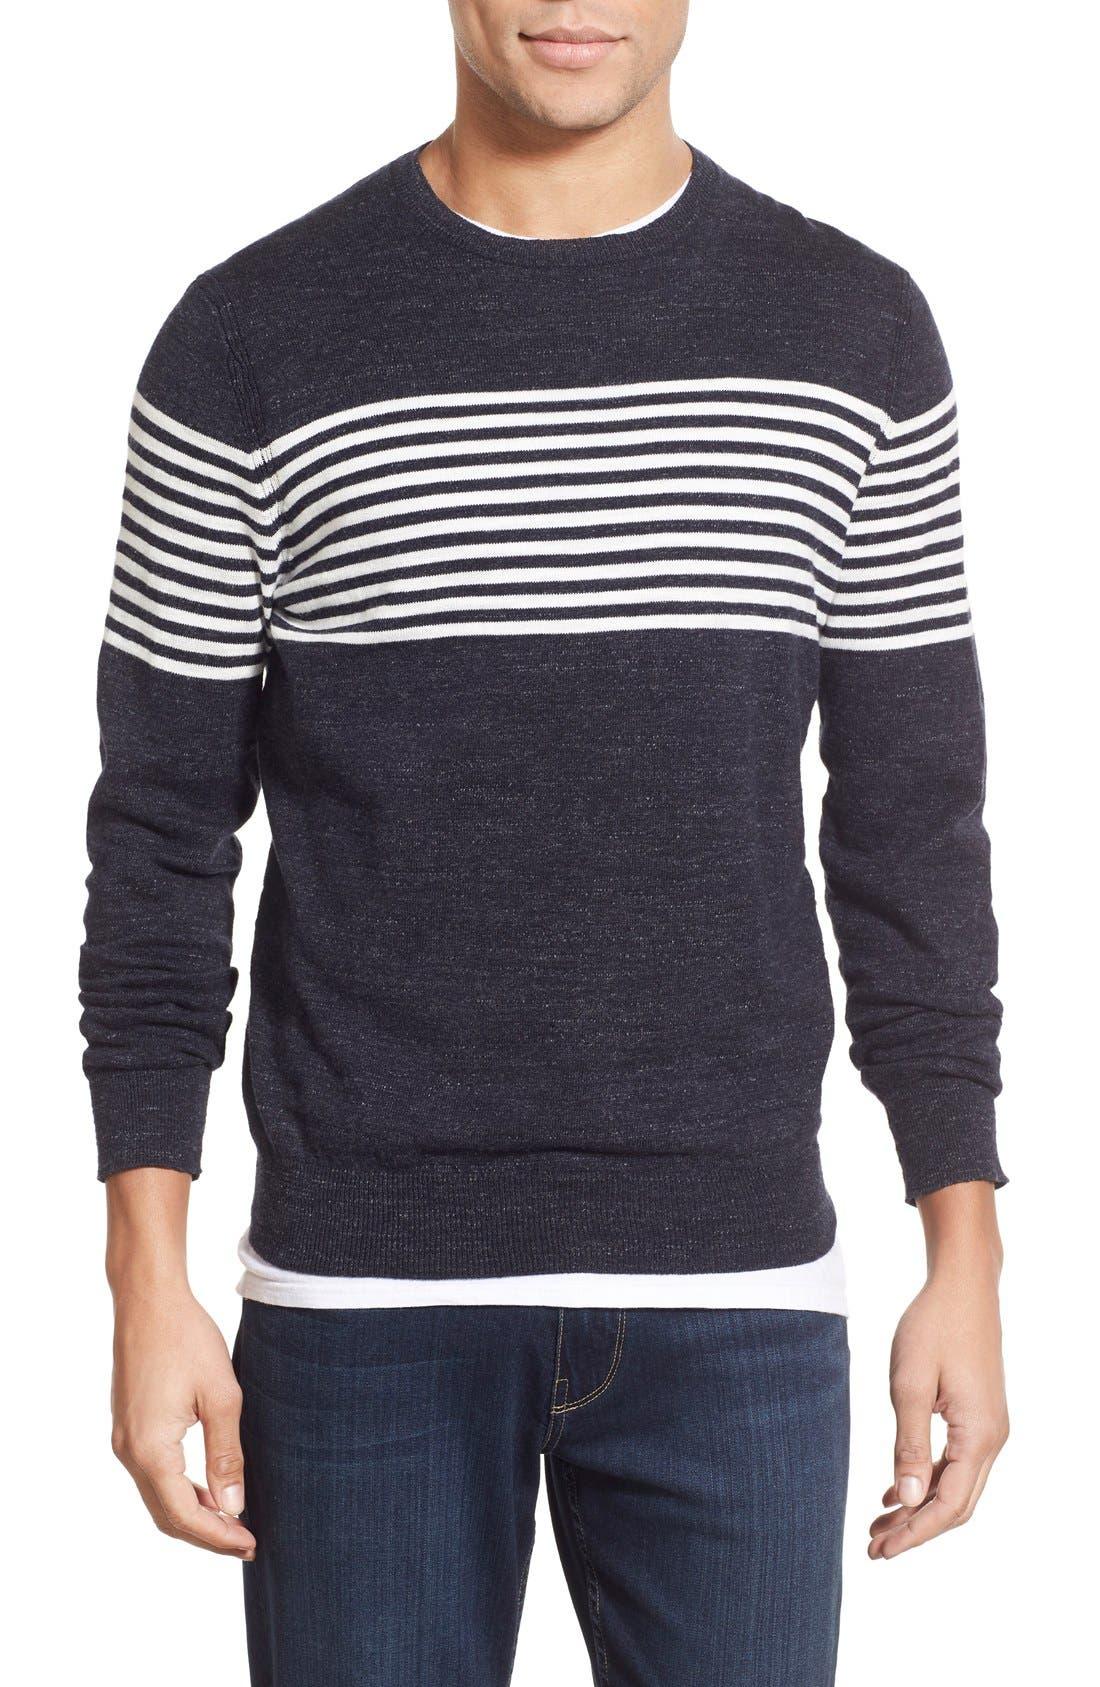 Alternate Image 1 Selected - Grayers 'Shore Club' Chest Stripe Crewneck Sweater